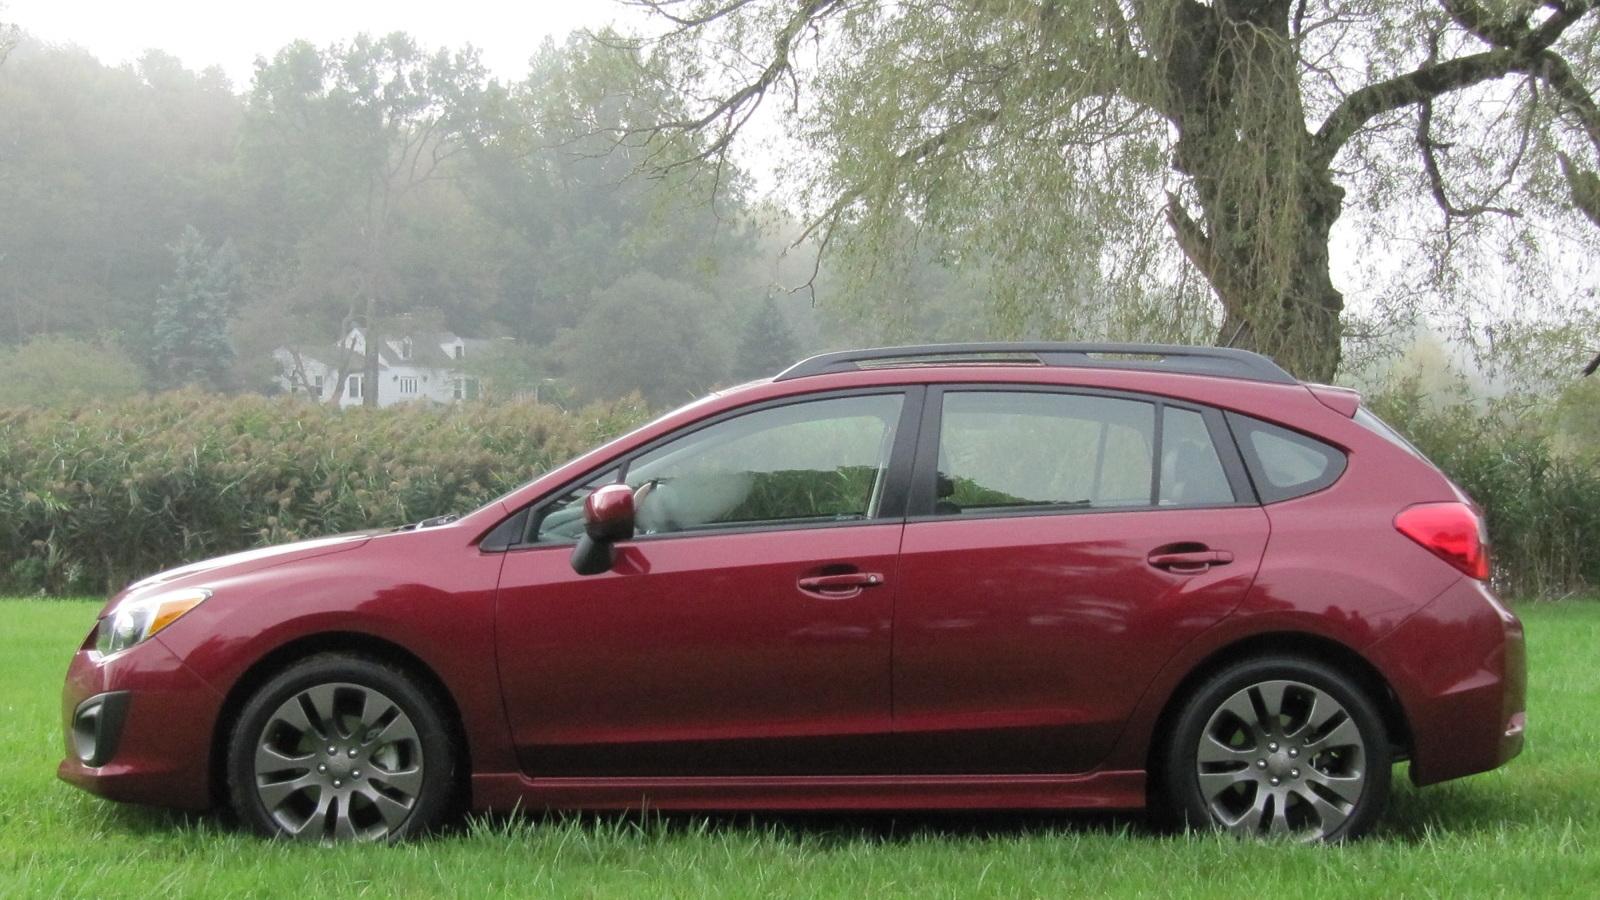 2012 Subaru Impreza hatchback, Connecticut, Sept 2011